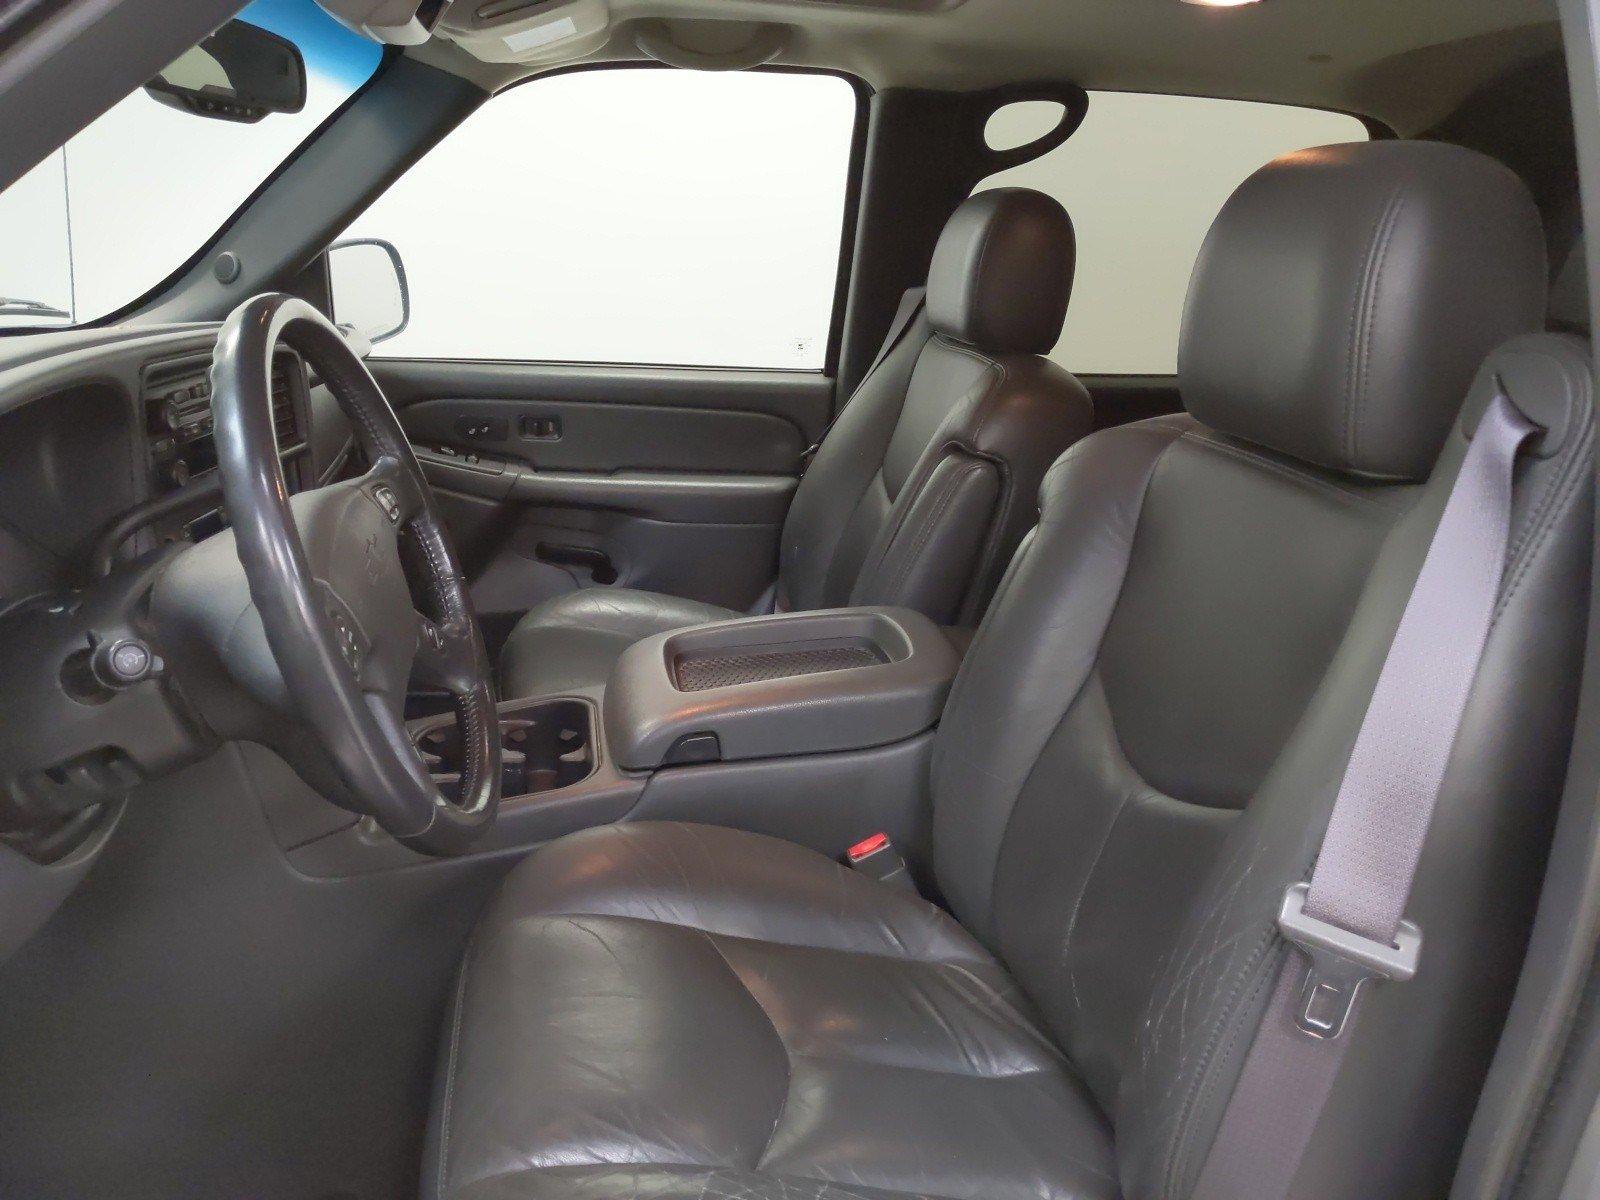 Used 2004 Chevrolet Avalanche Z71 Crew Cab Pickup for sale in Grand Island NE